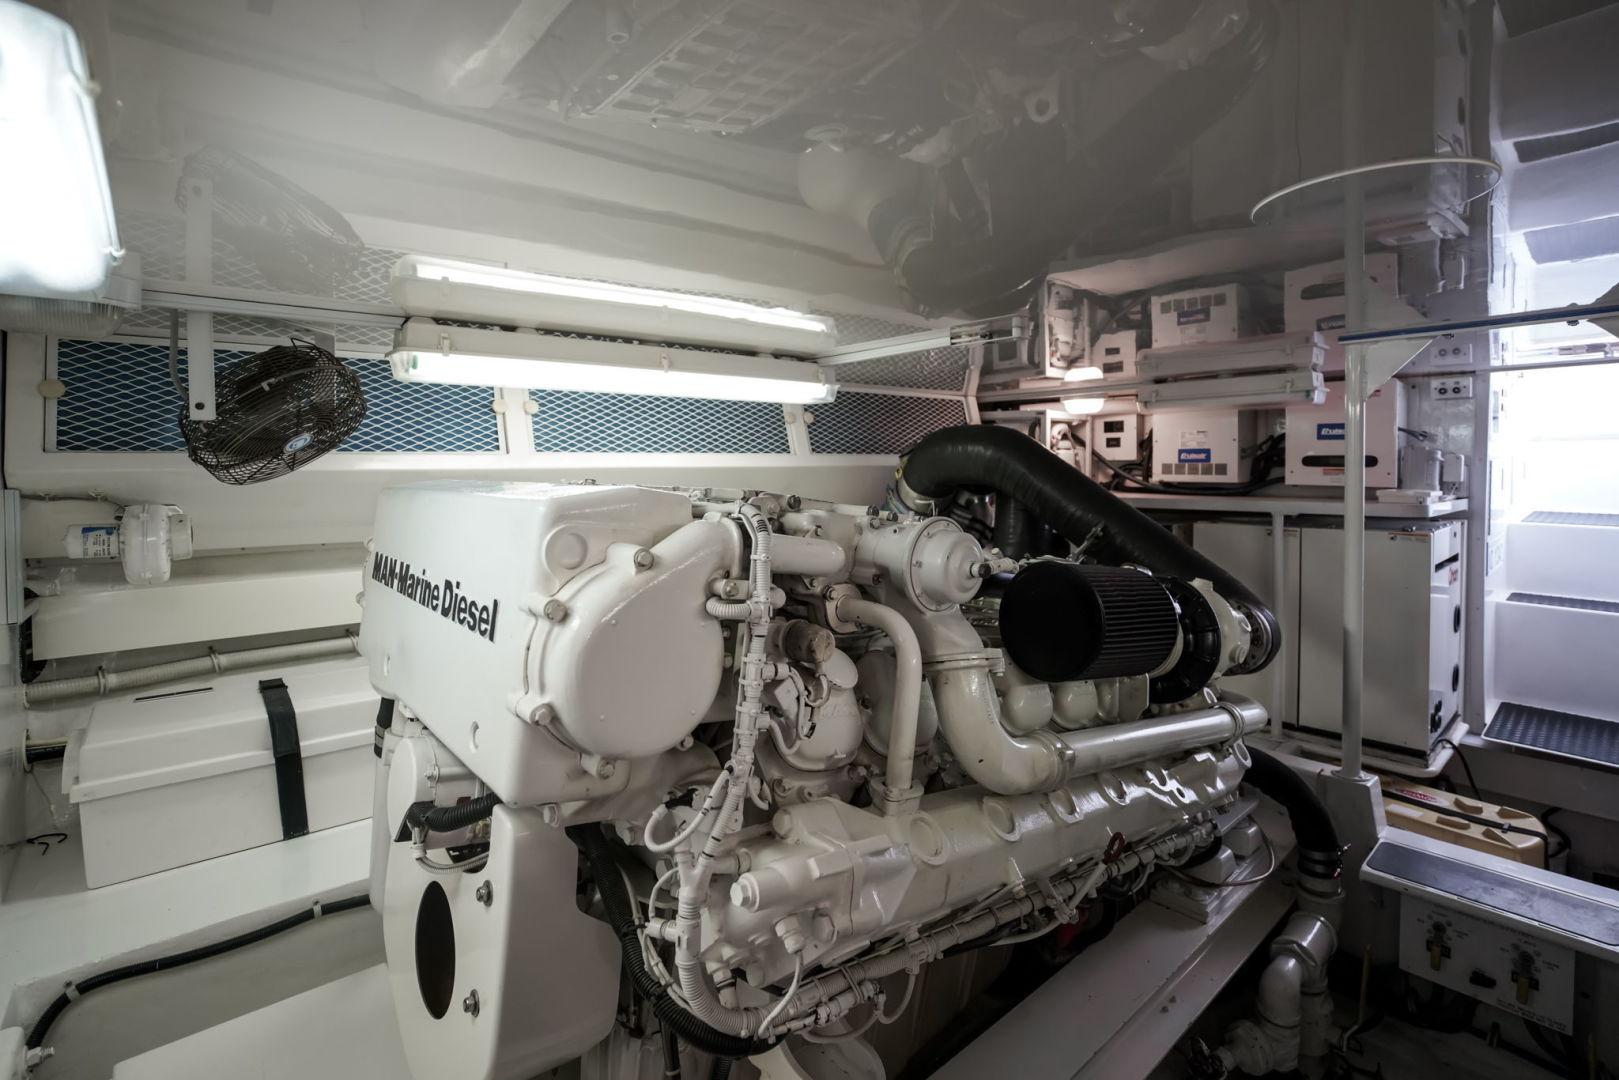 Viking-Convertible 2002-Blue Eyes North Palm Beach-Florida-United States-Engine Room-1490396   Thumbnail